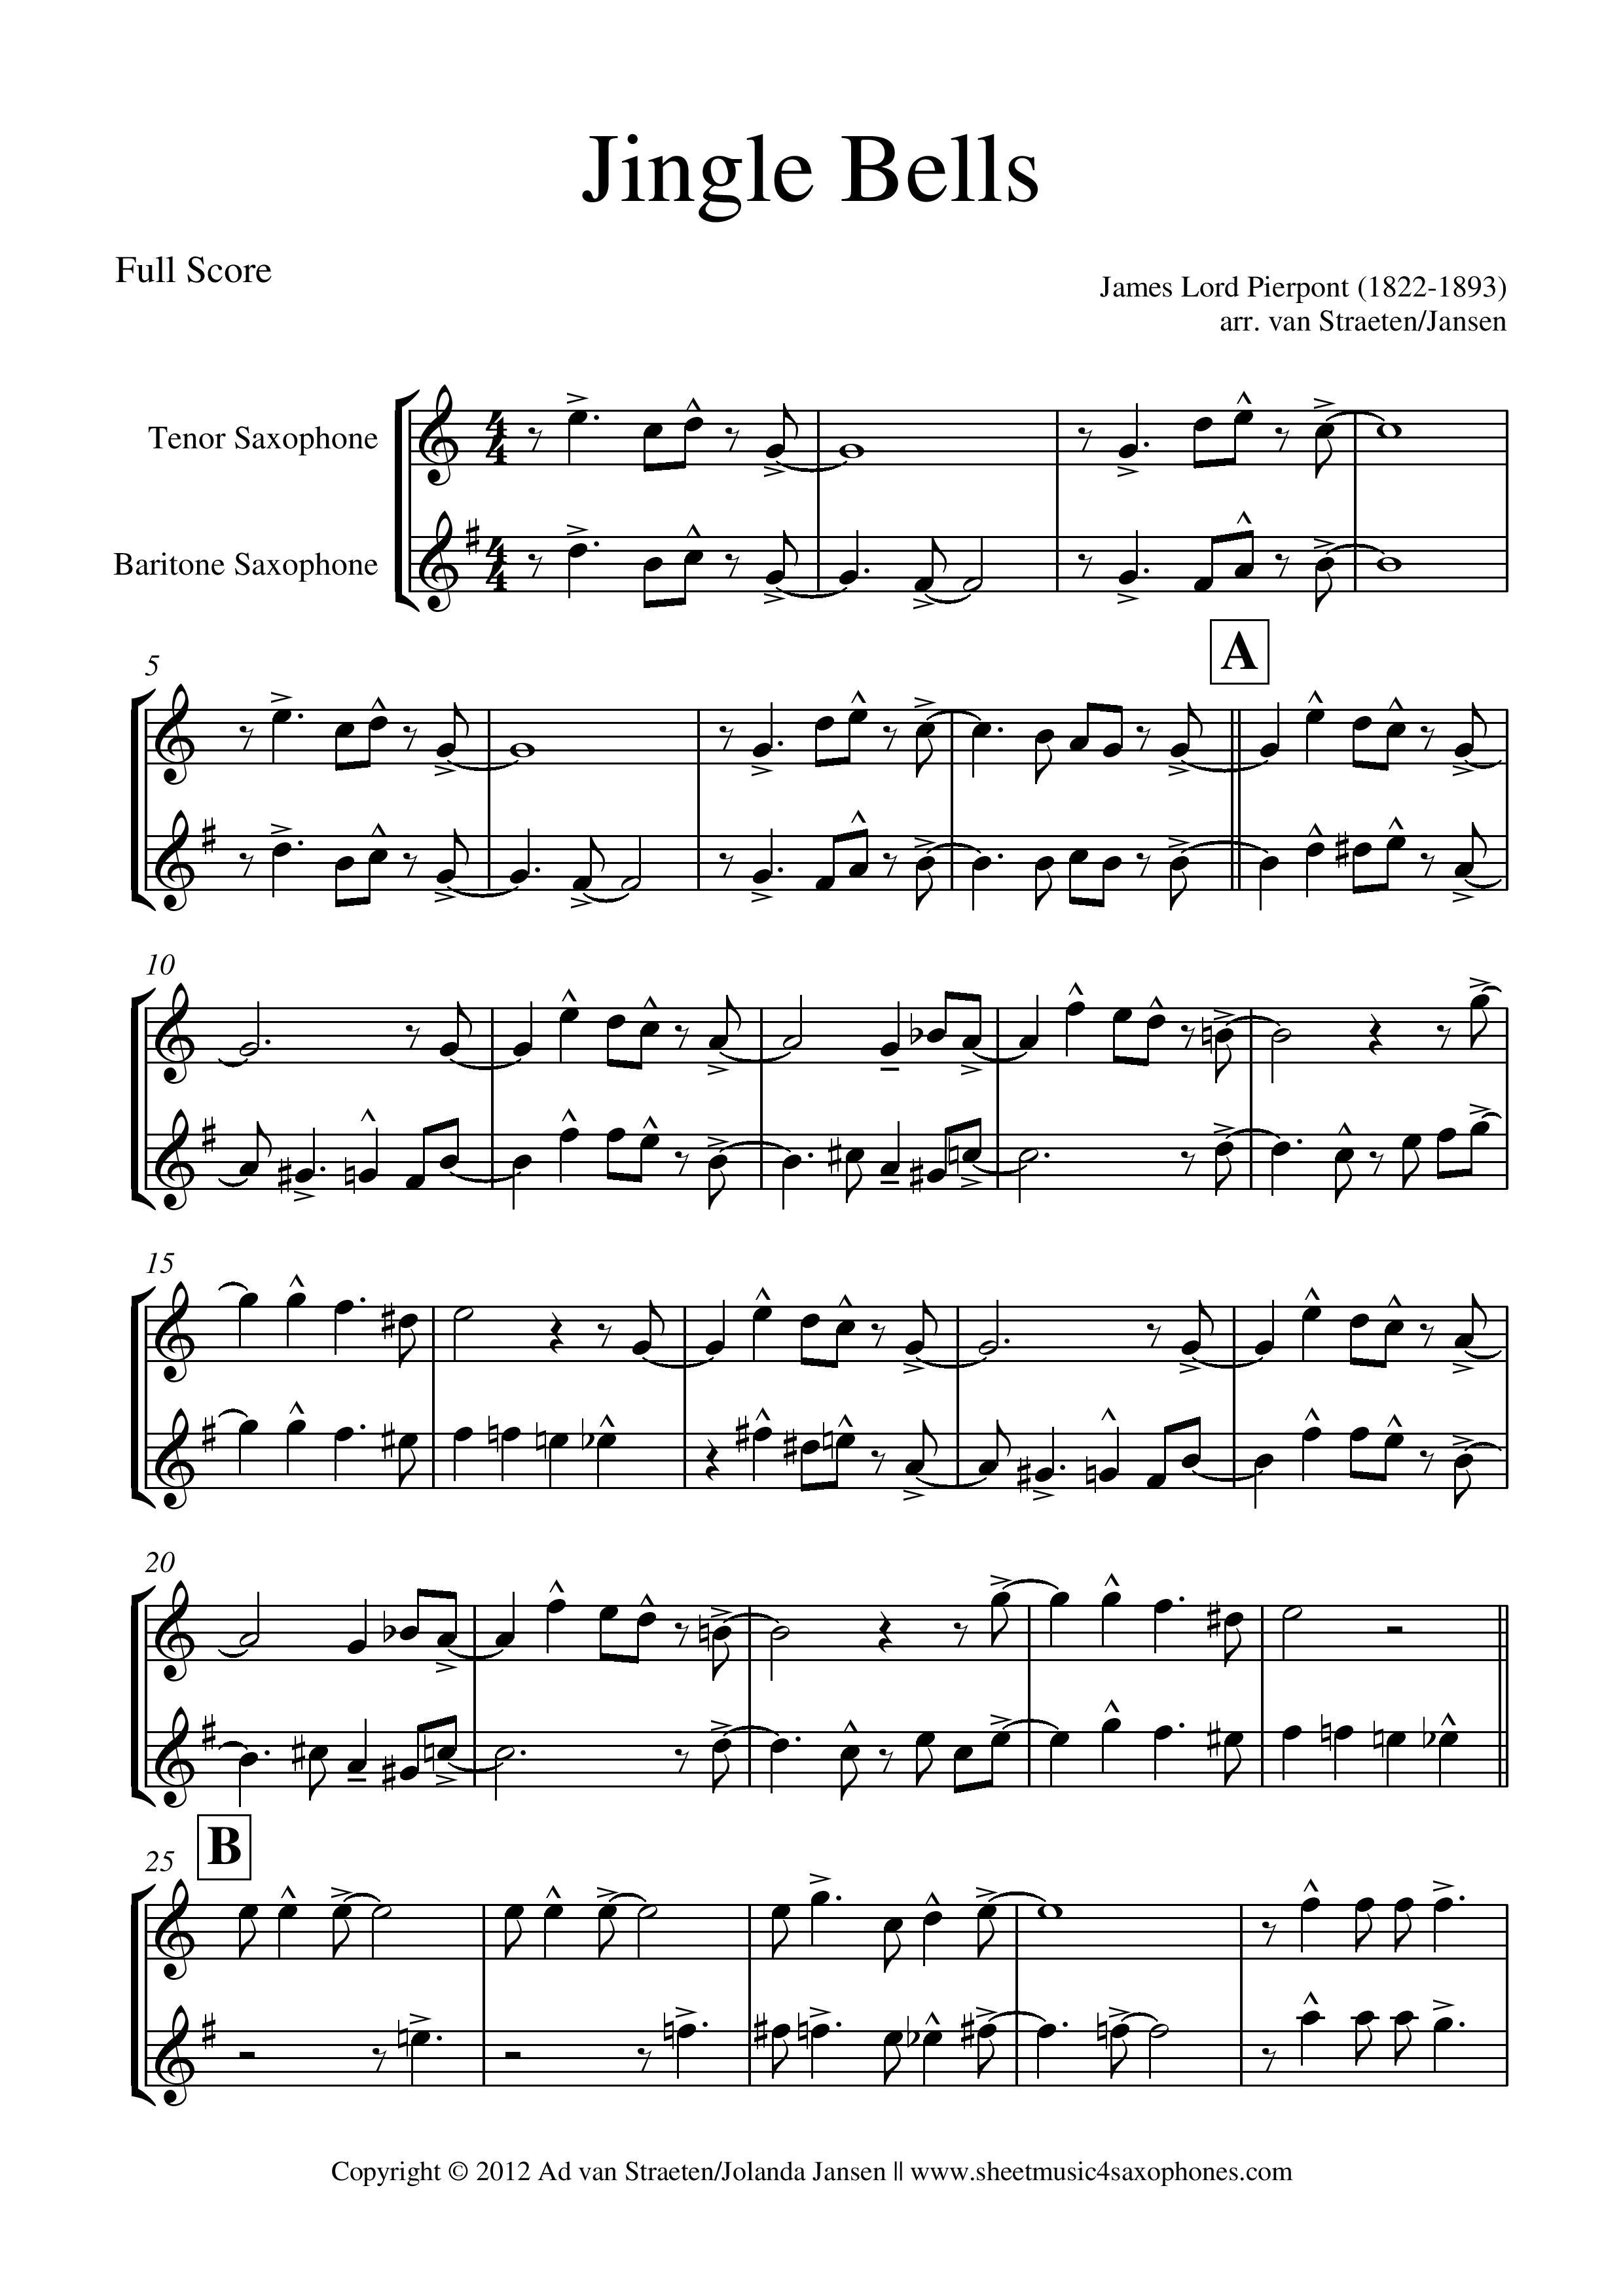 Jingle Bells Jazz Sheet Music